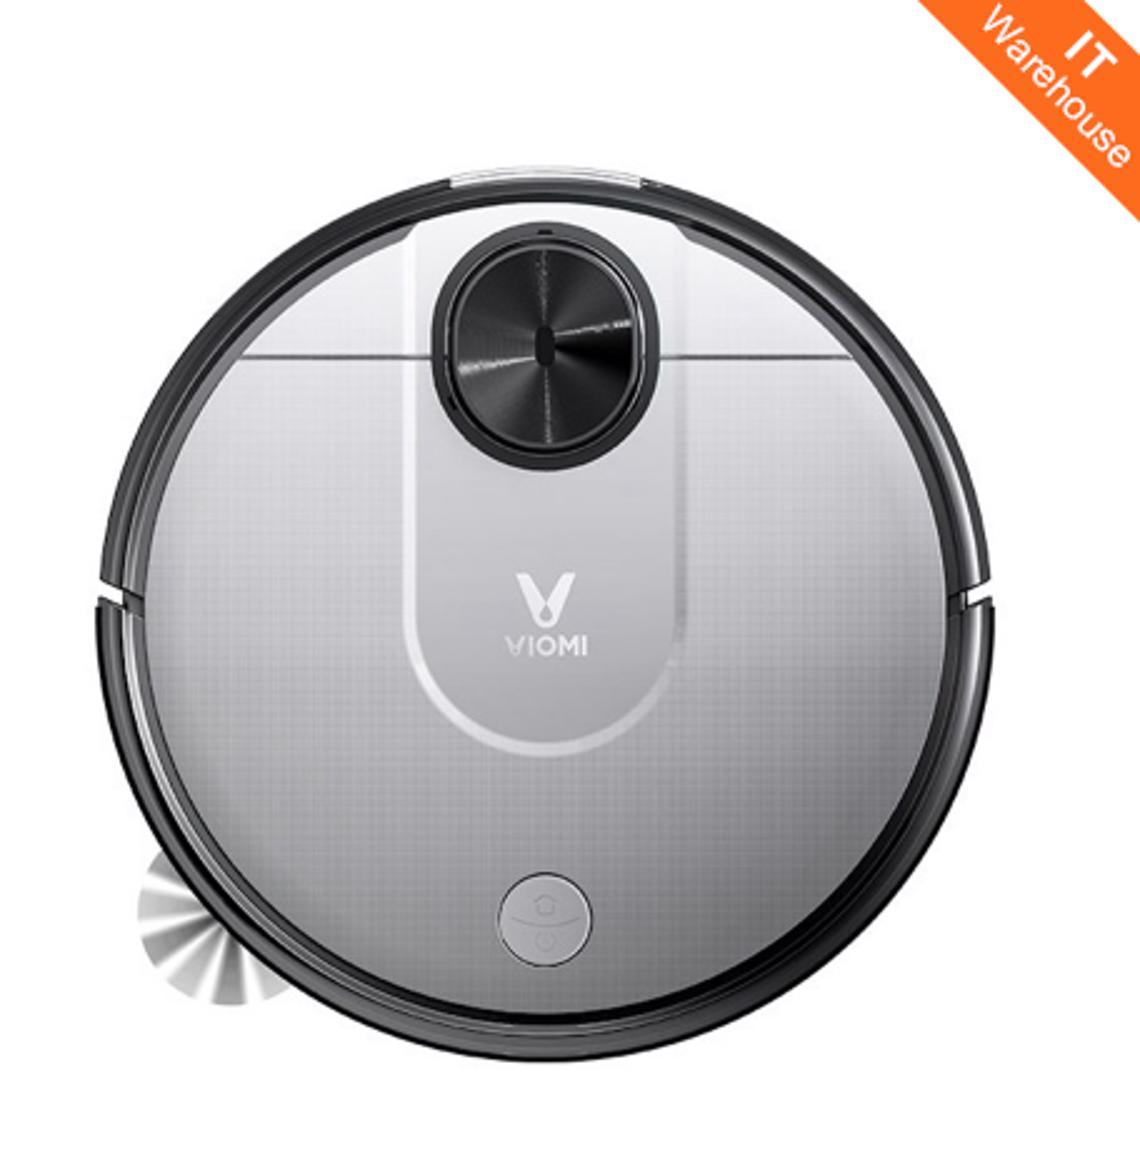 小米Viomi V2 Pro  -  Geekbuying